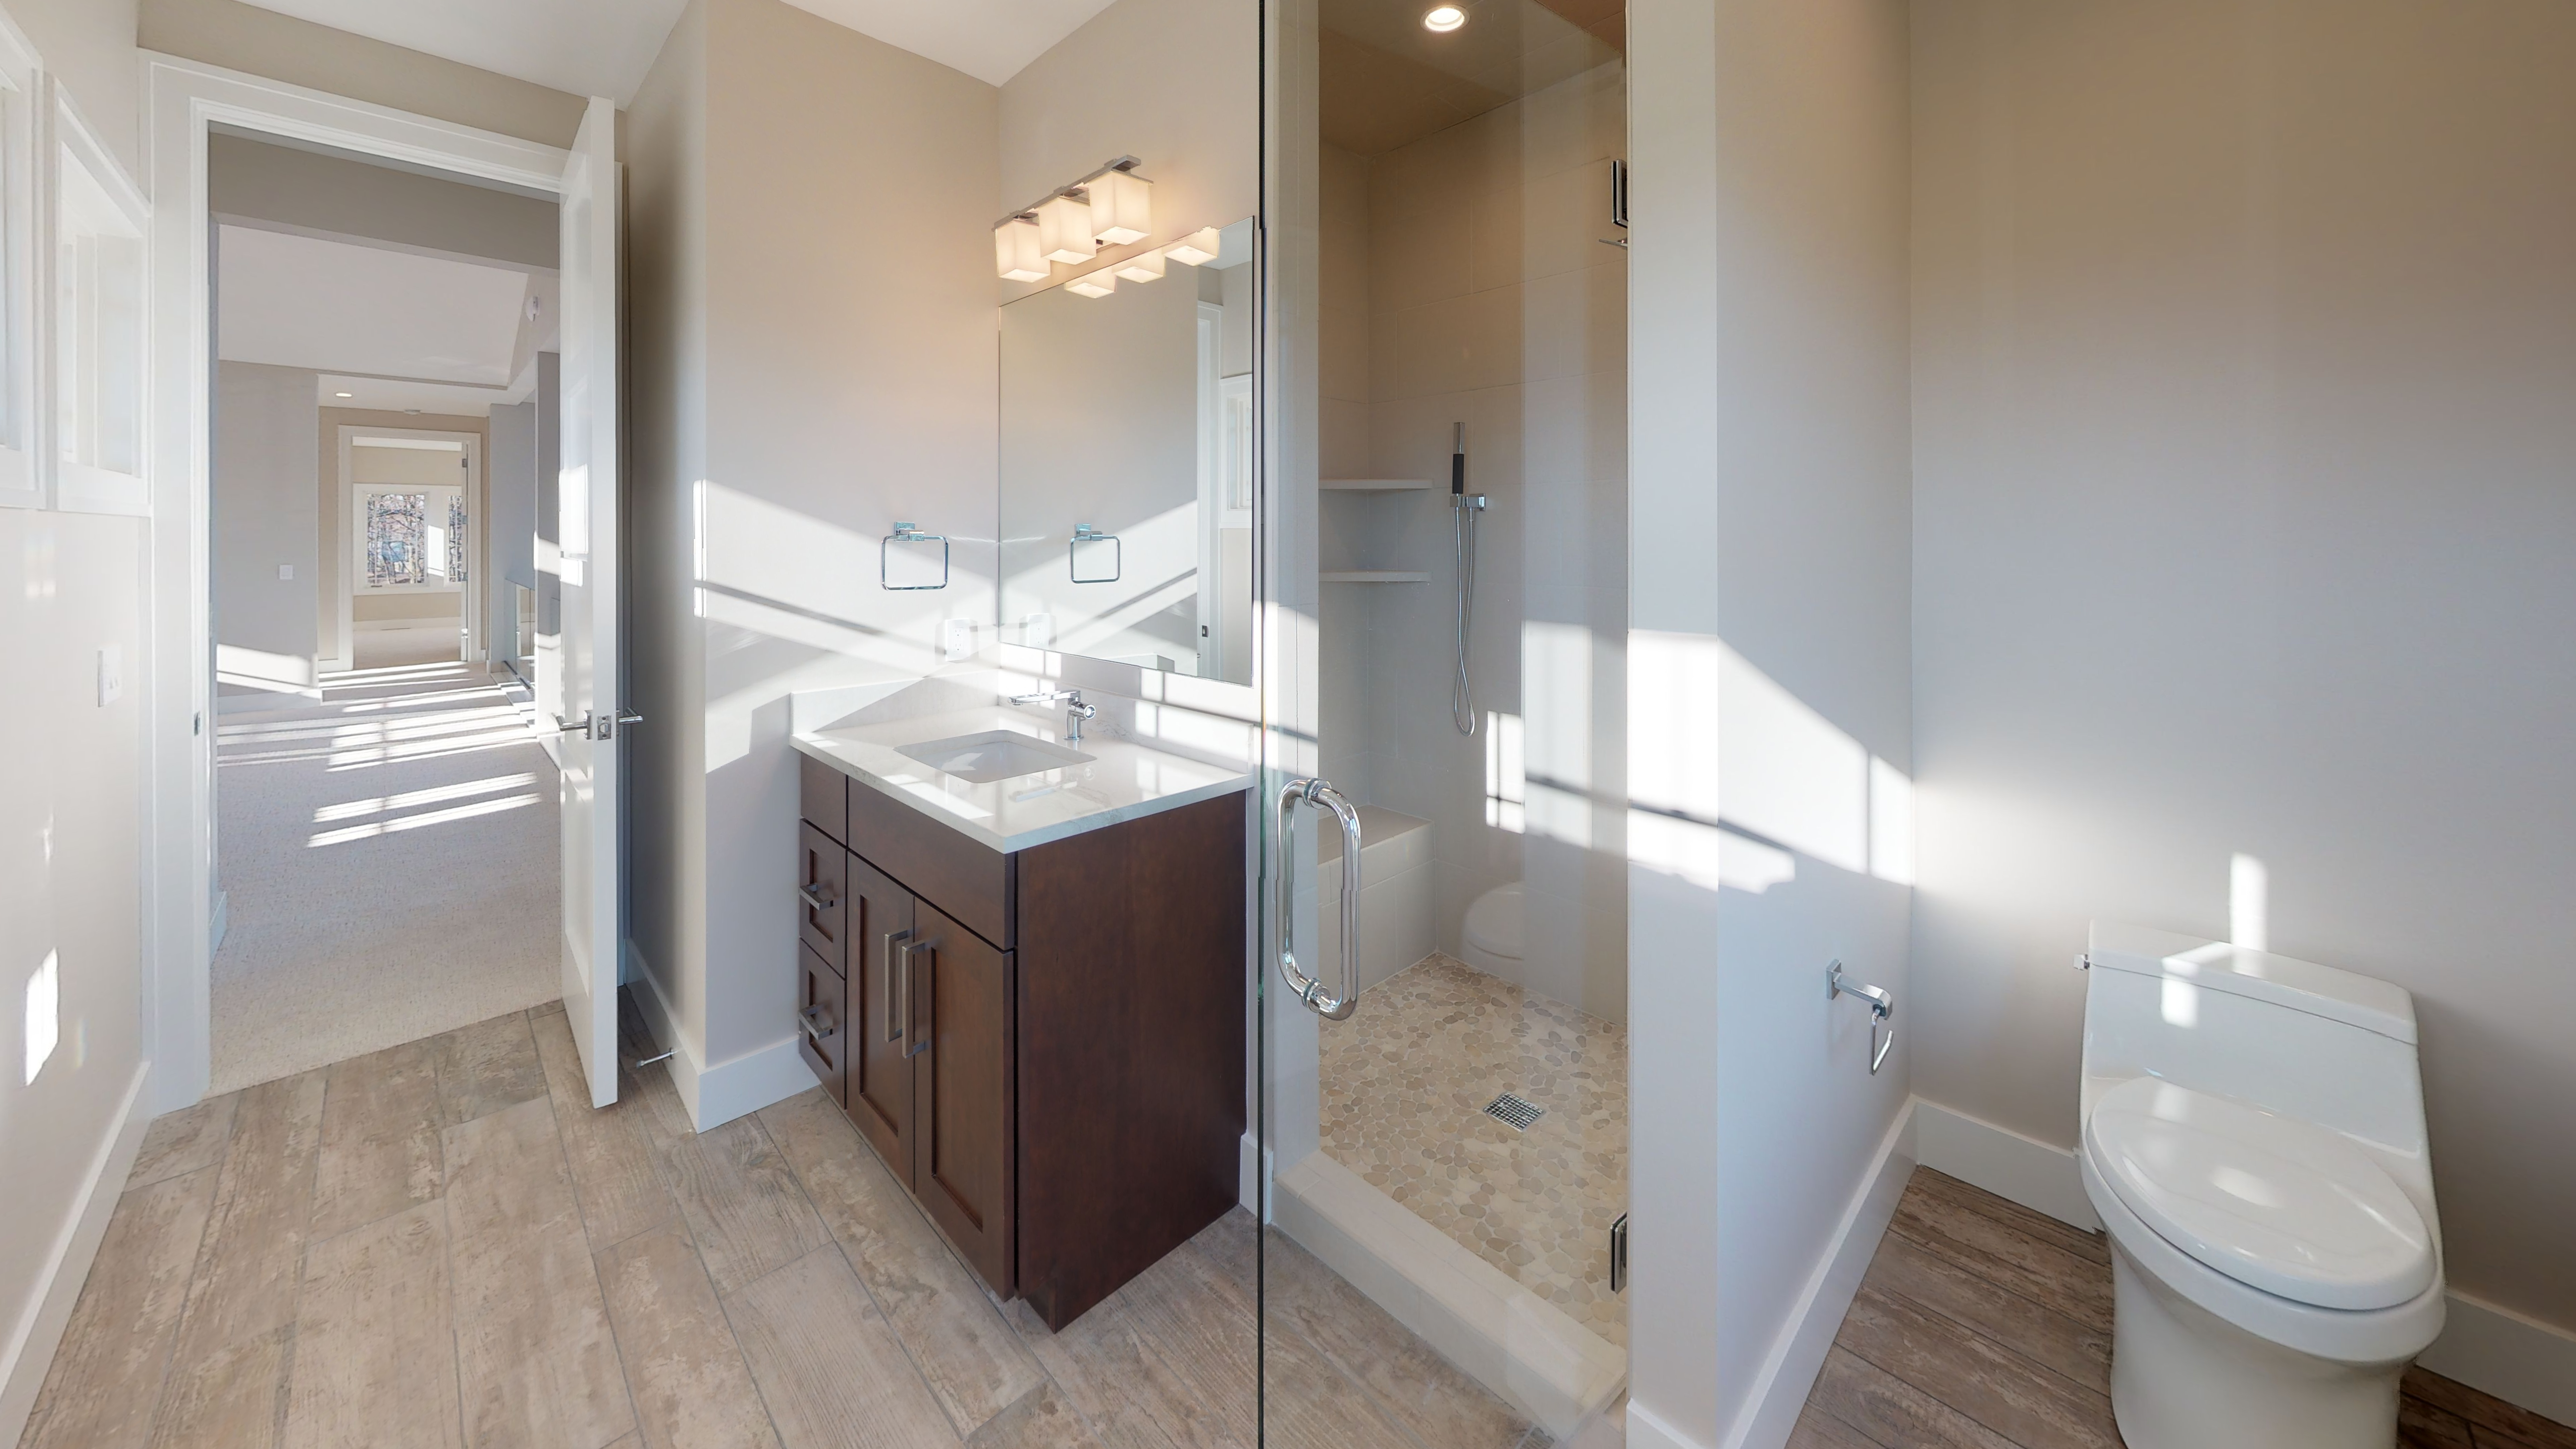 385-Chestnut-Ridge-Bathroom(2).jpg